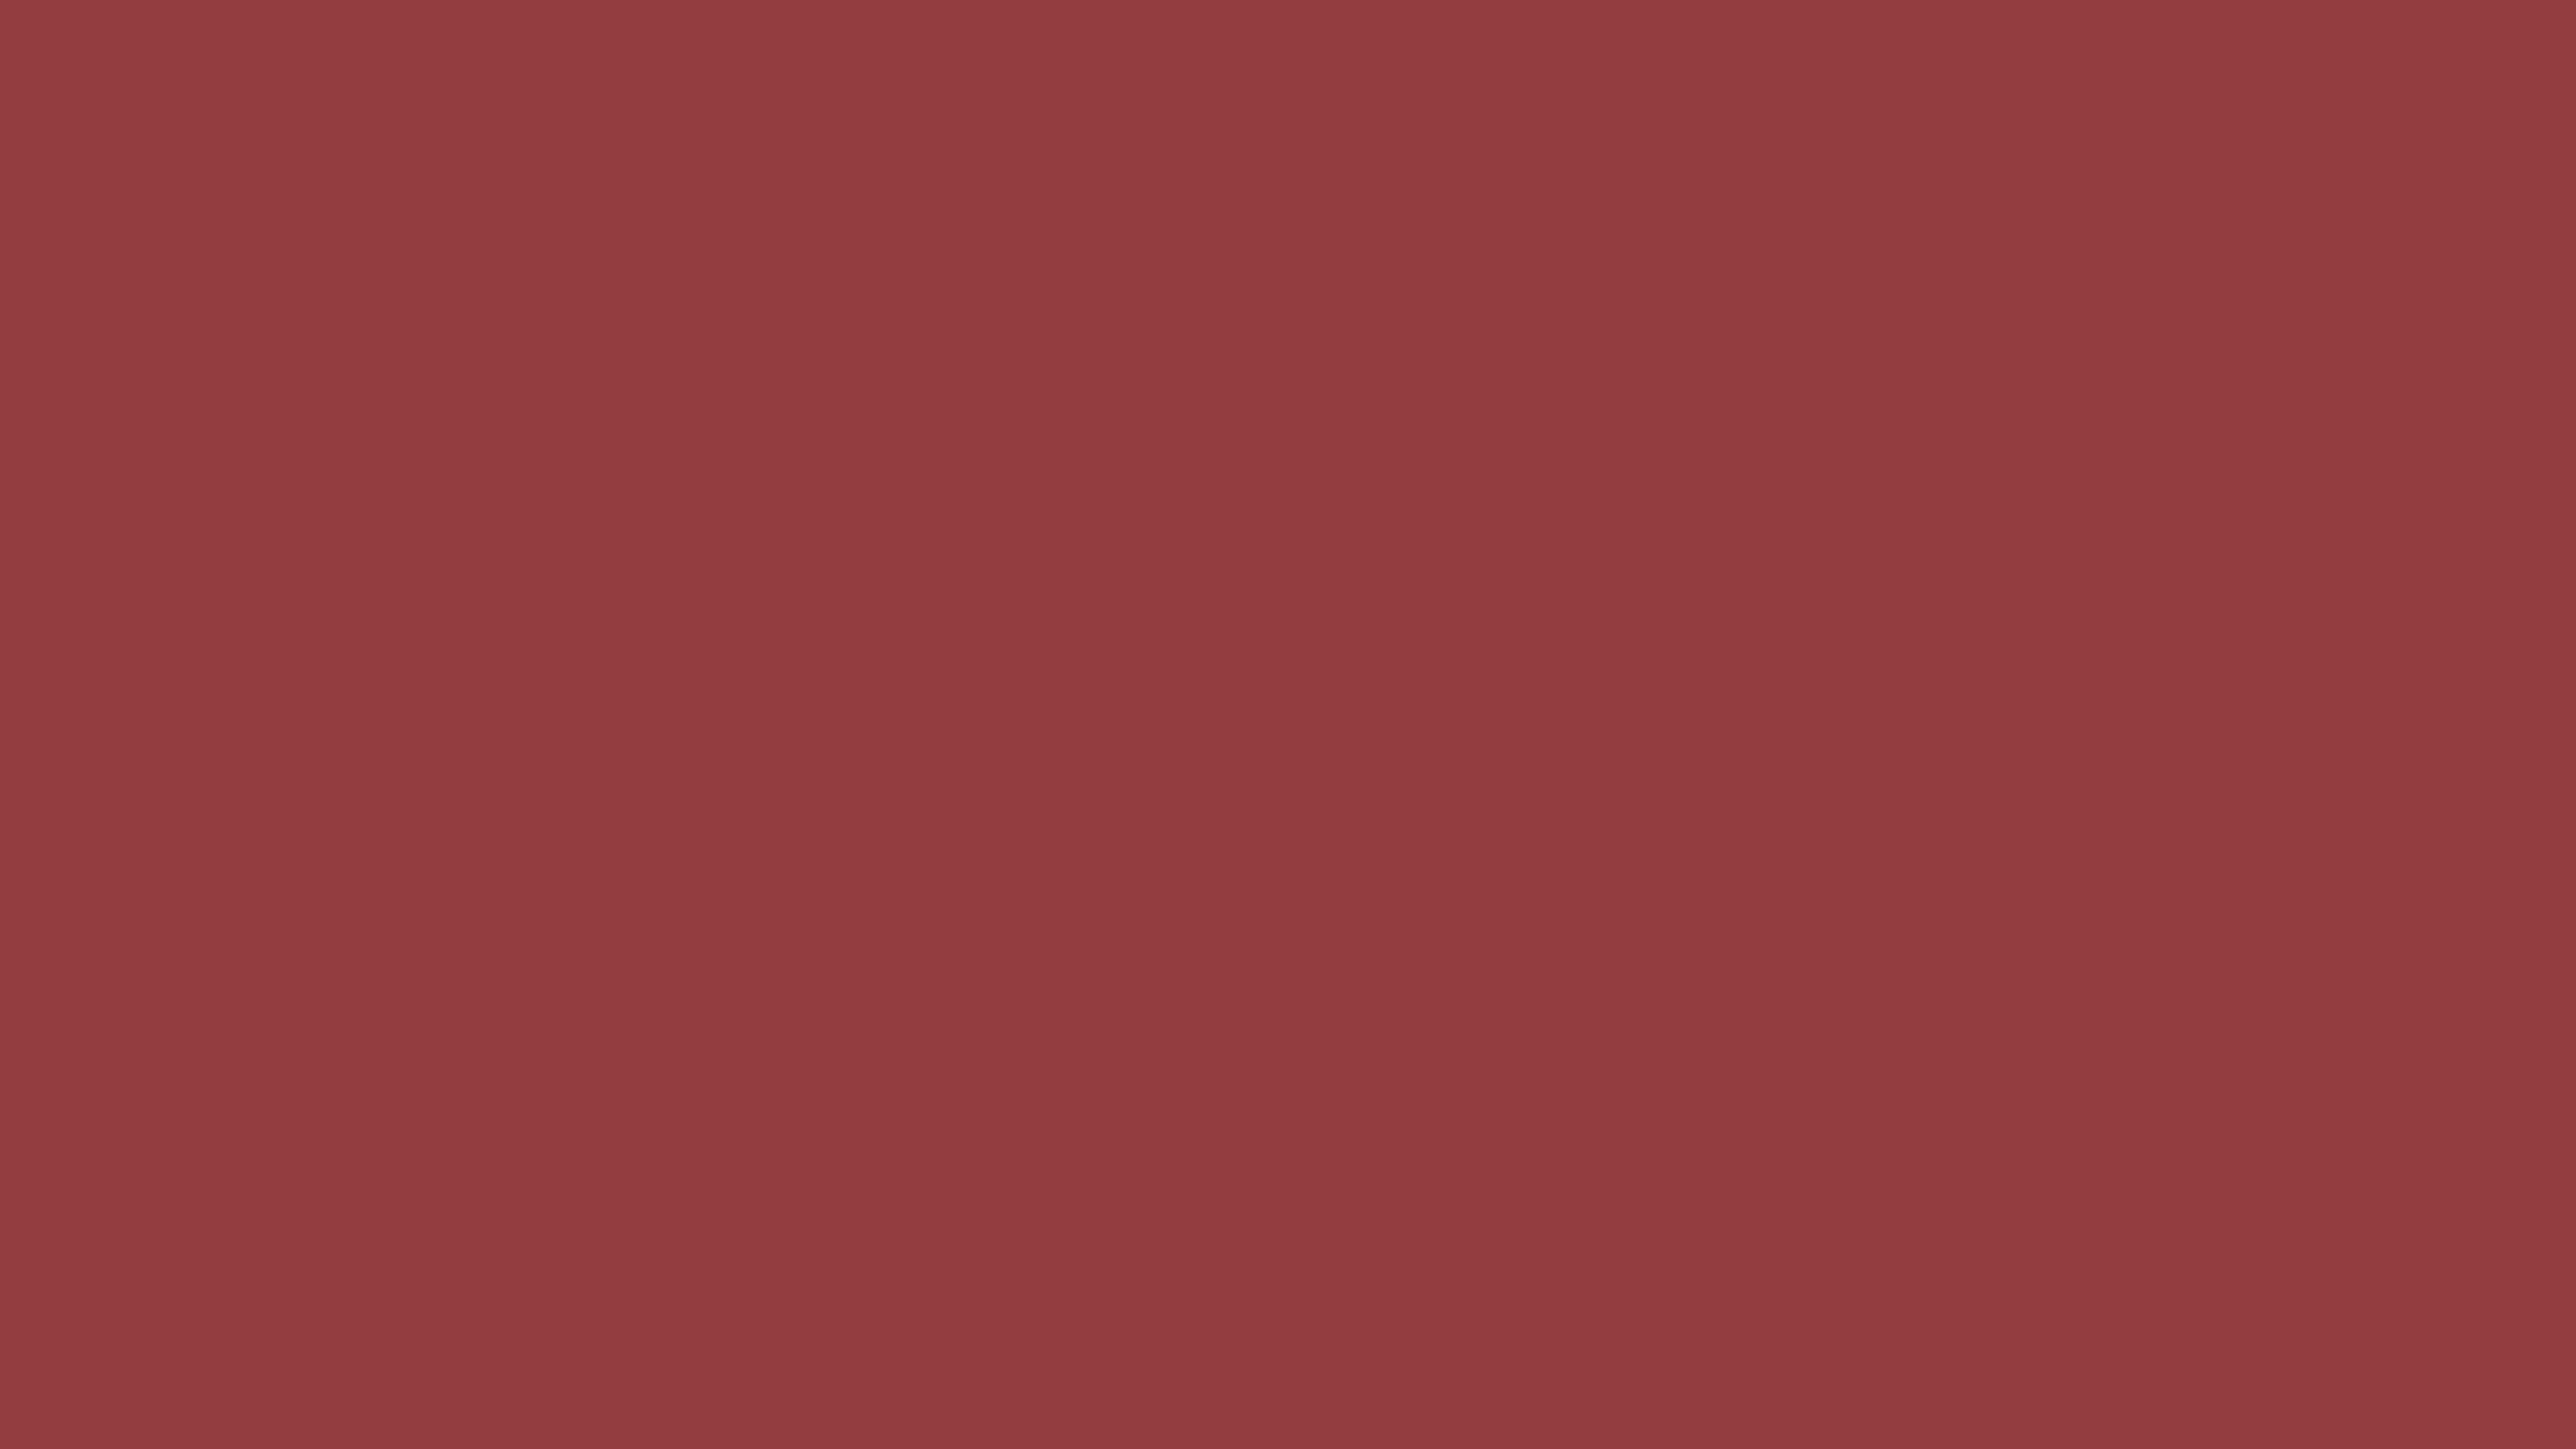 7680x4320 Smokey Topaz Solid Color Background